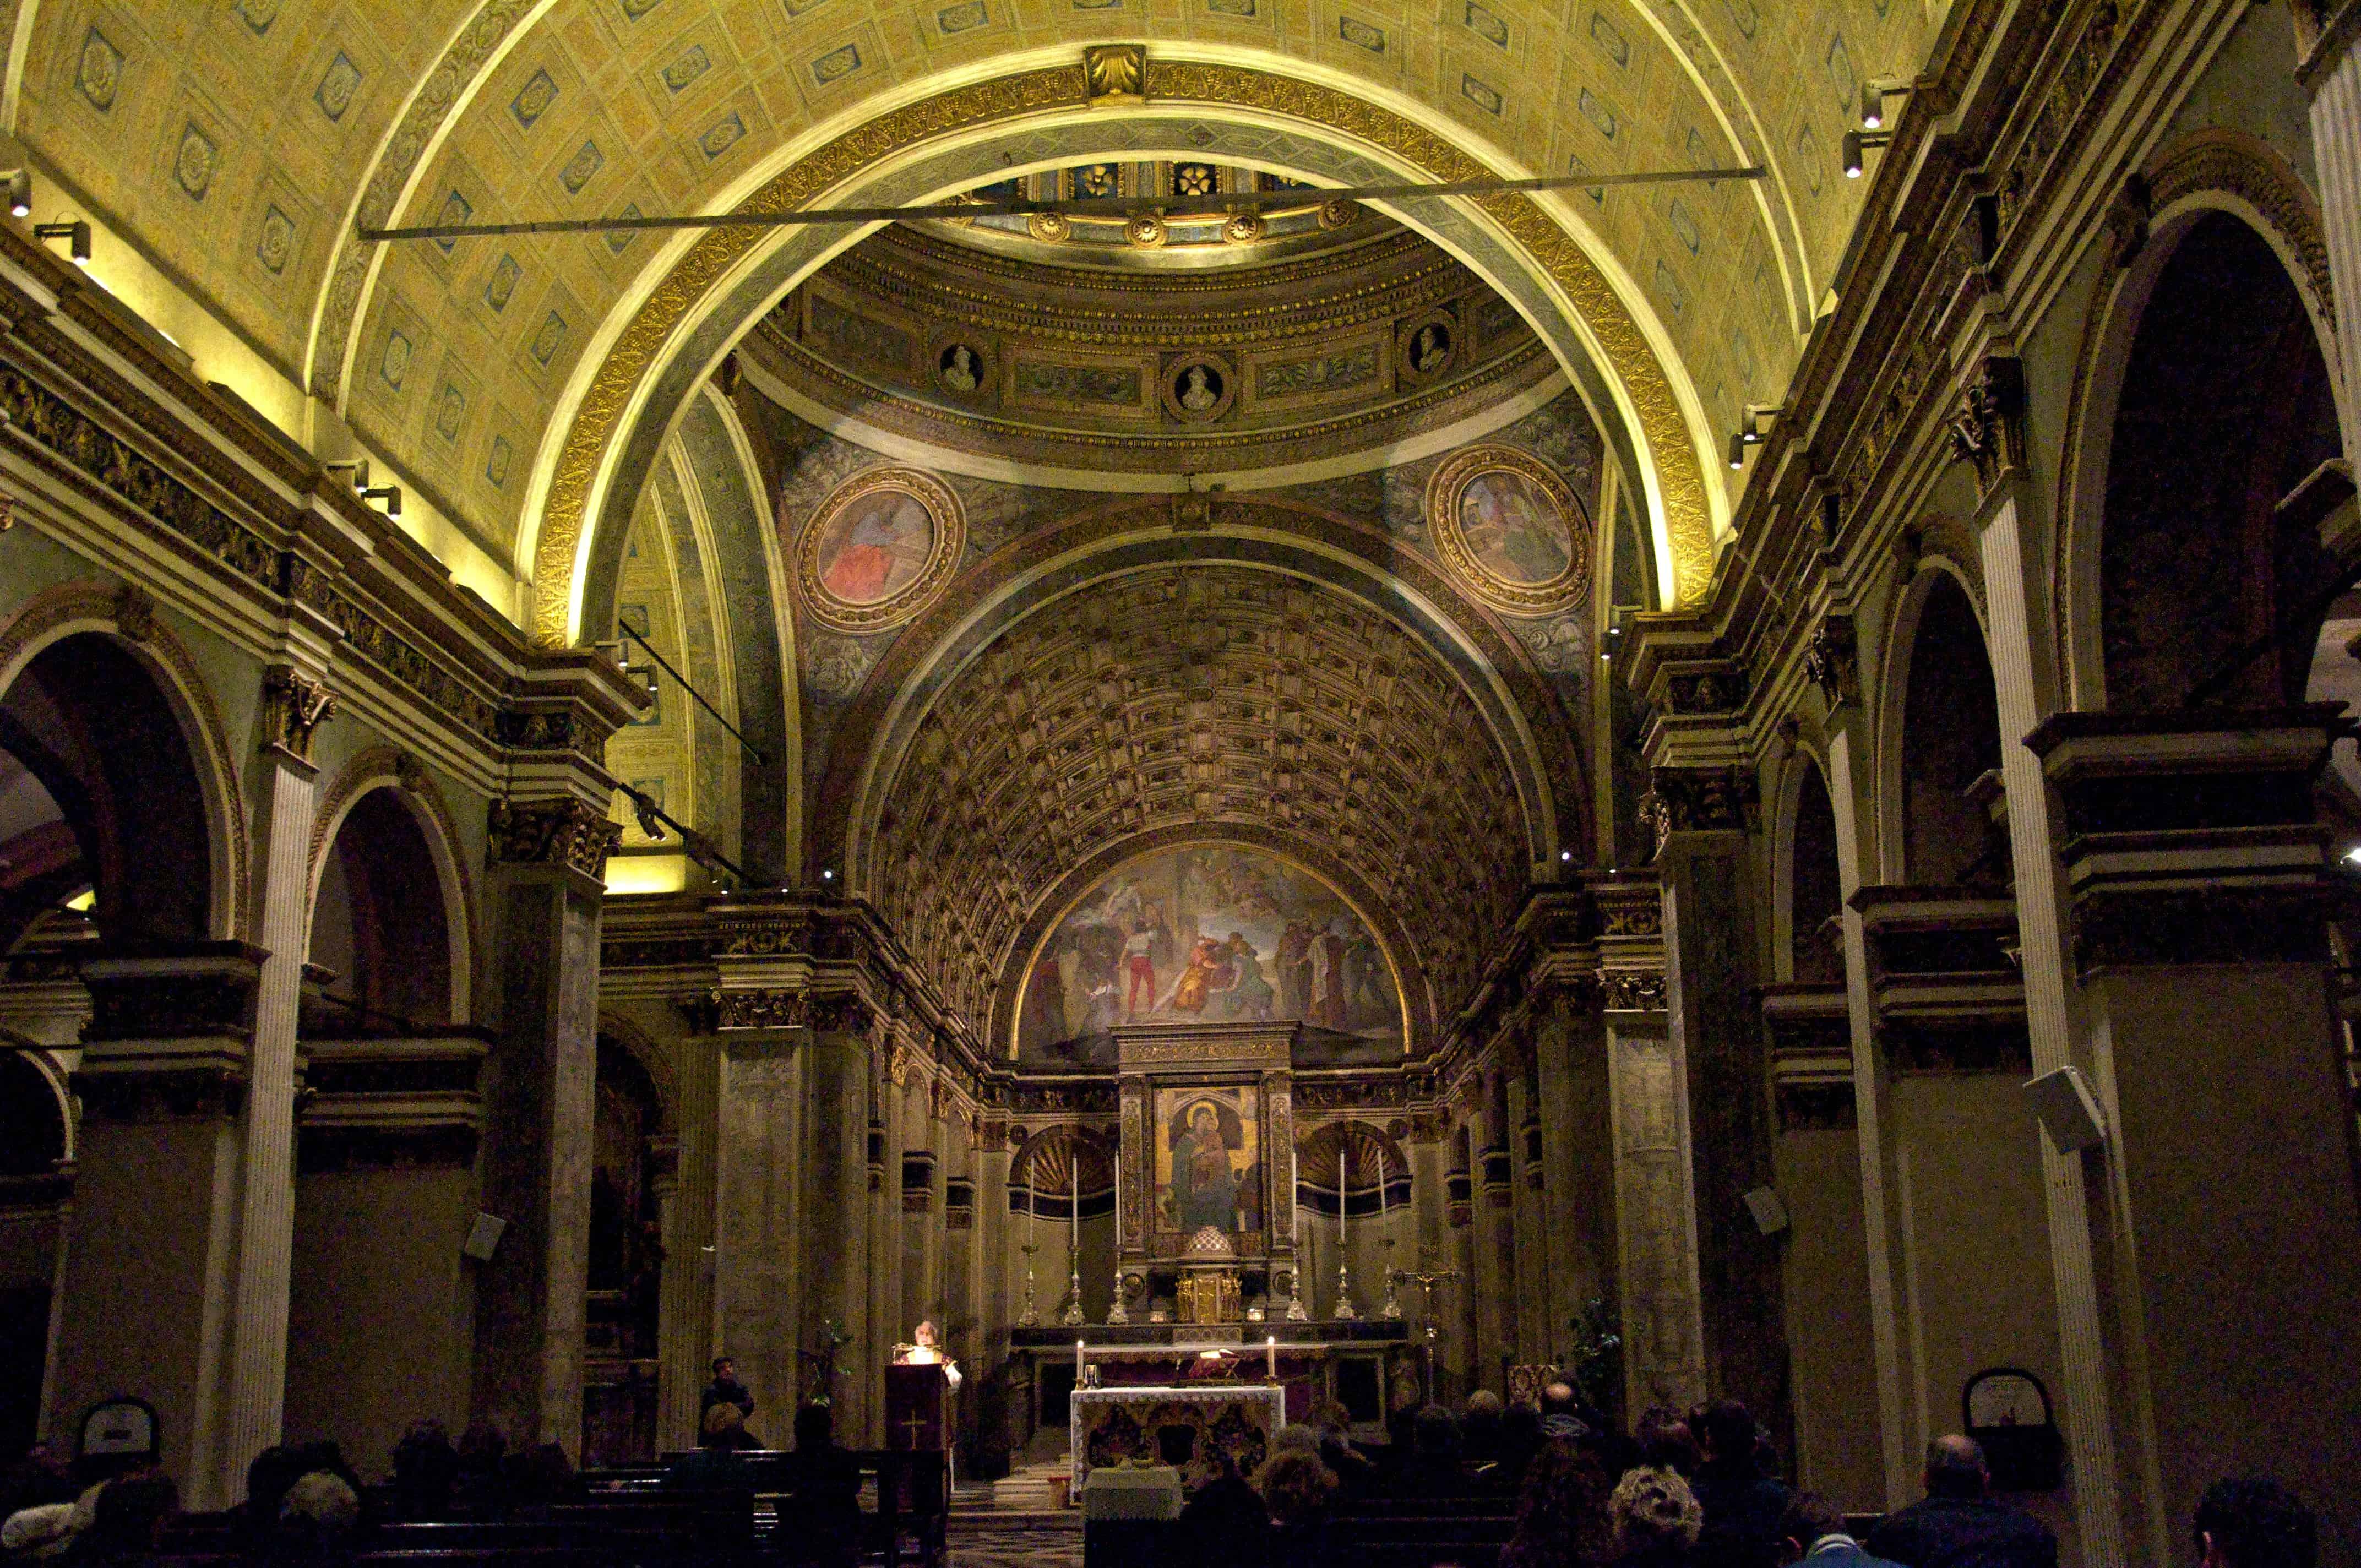 Chiesa Santa Maria Presso di San Satiro, Milan